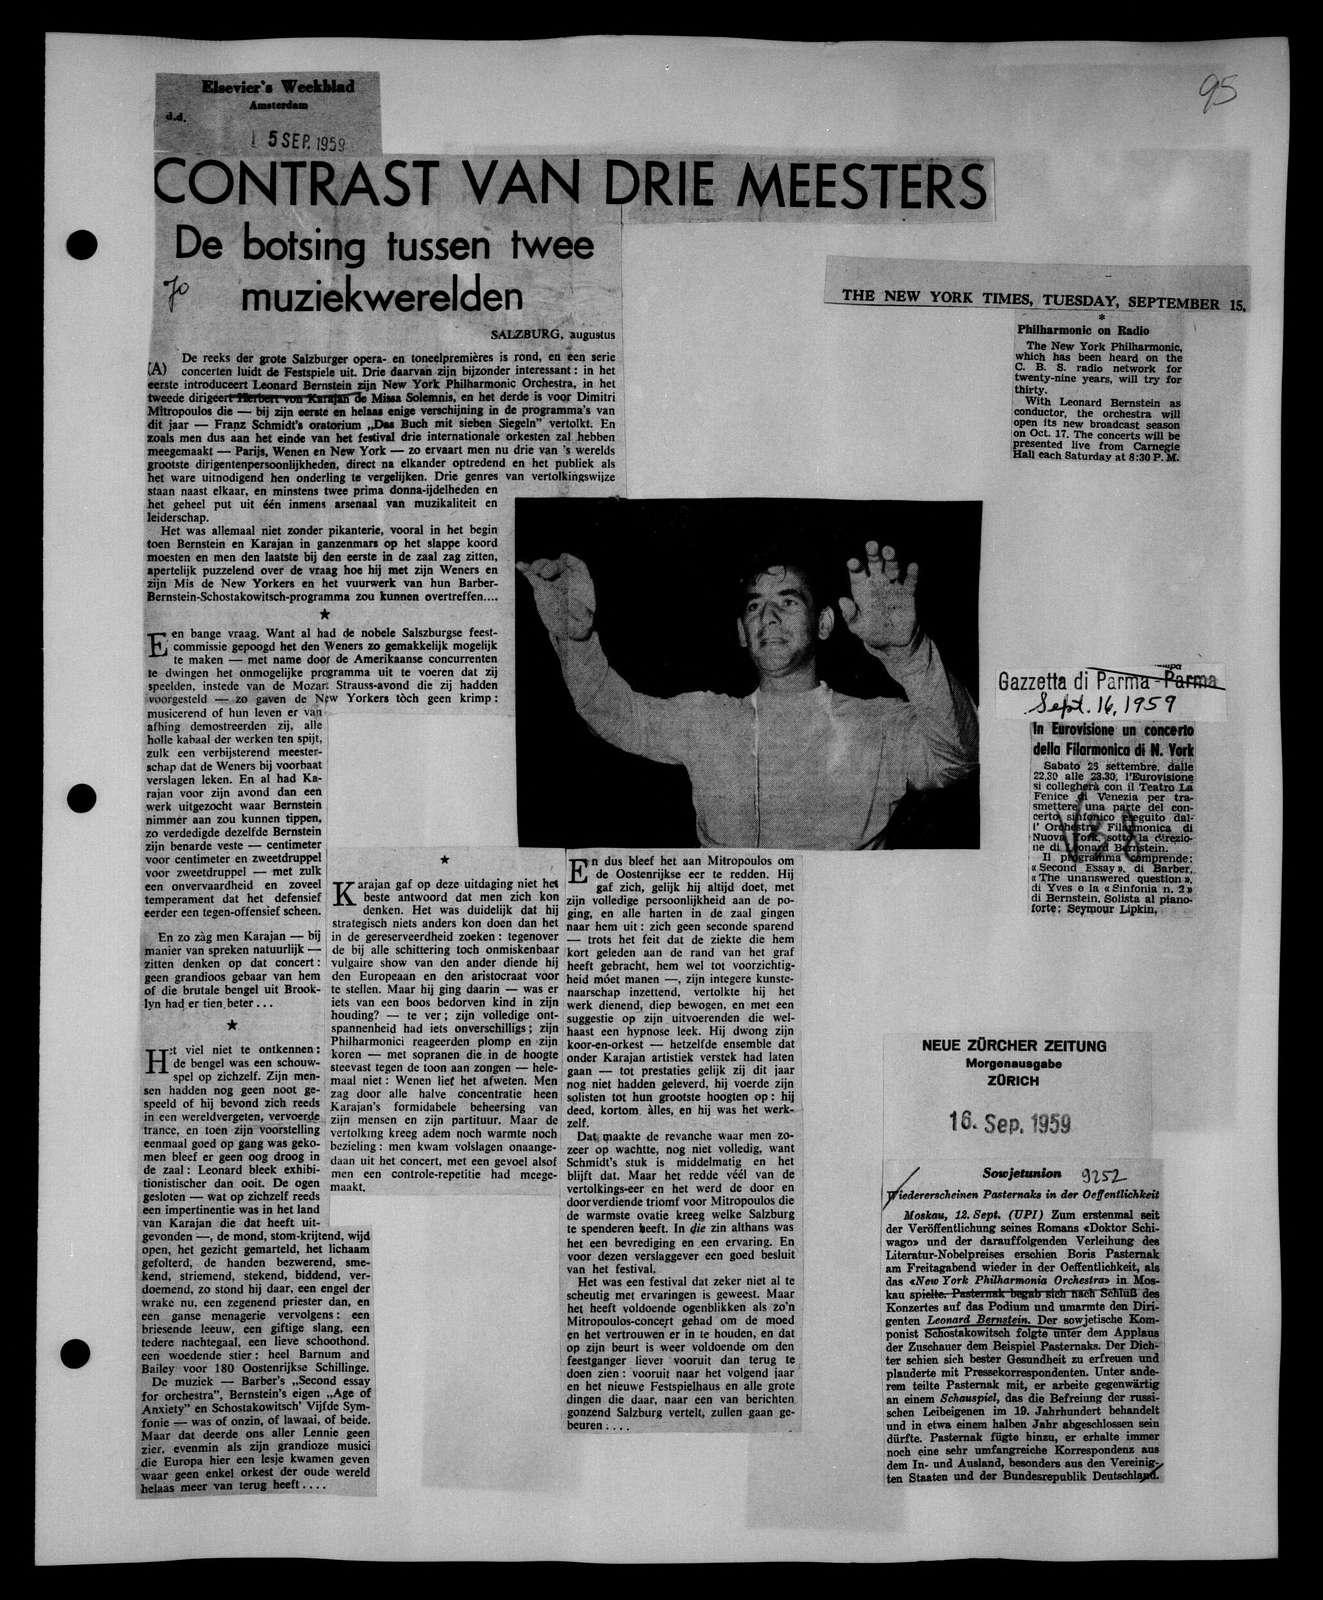 Leonard Bernstein Scrapbook: Vol. 32. Aug. 25, 1959-Sept. 24, 1959